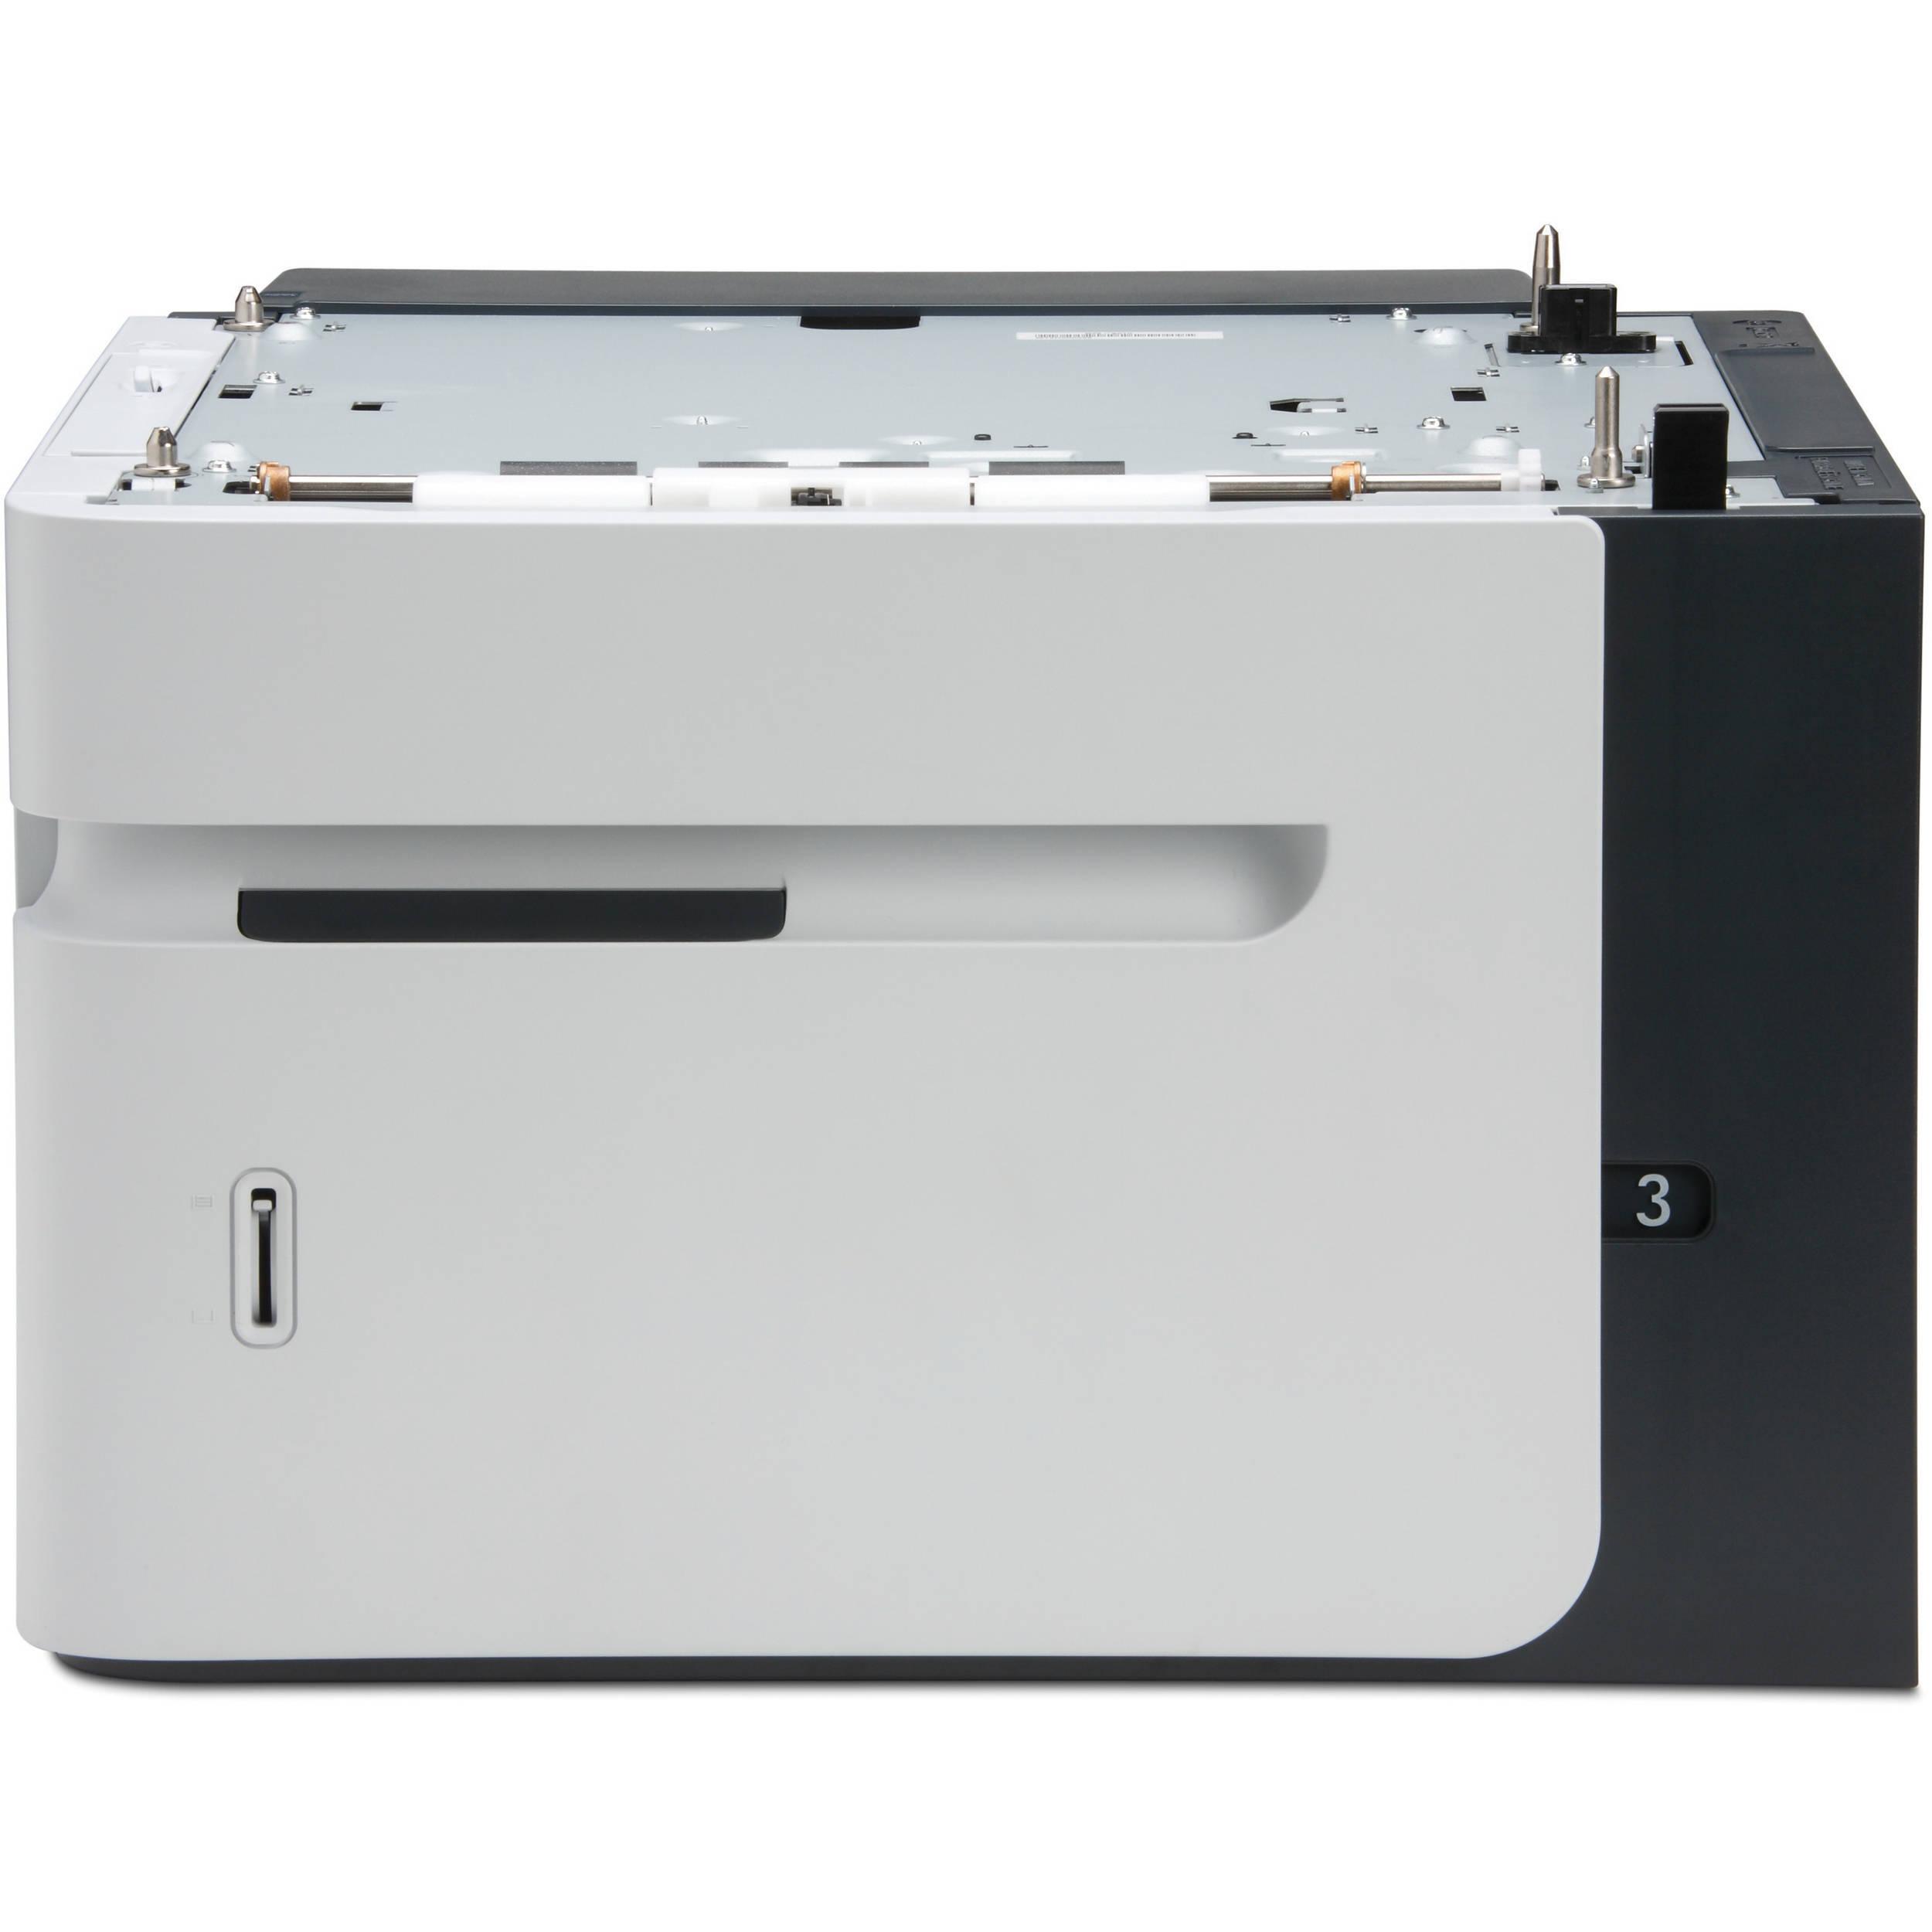 picture about Laserjet Printable Vinyl titled HP Shelf Label Enter Tray For LaserJet P4000 Collection